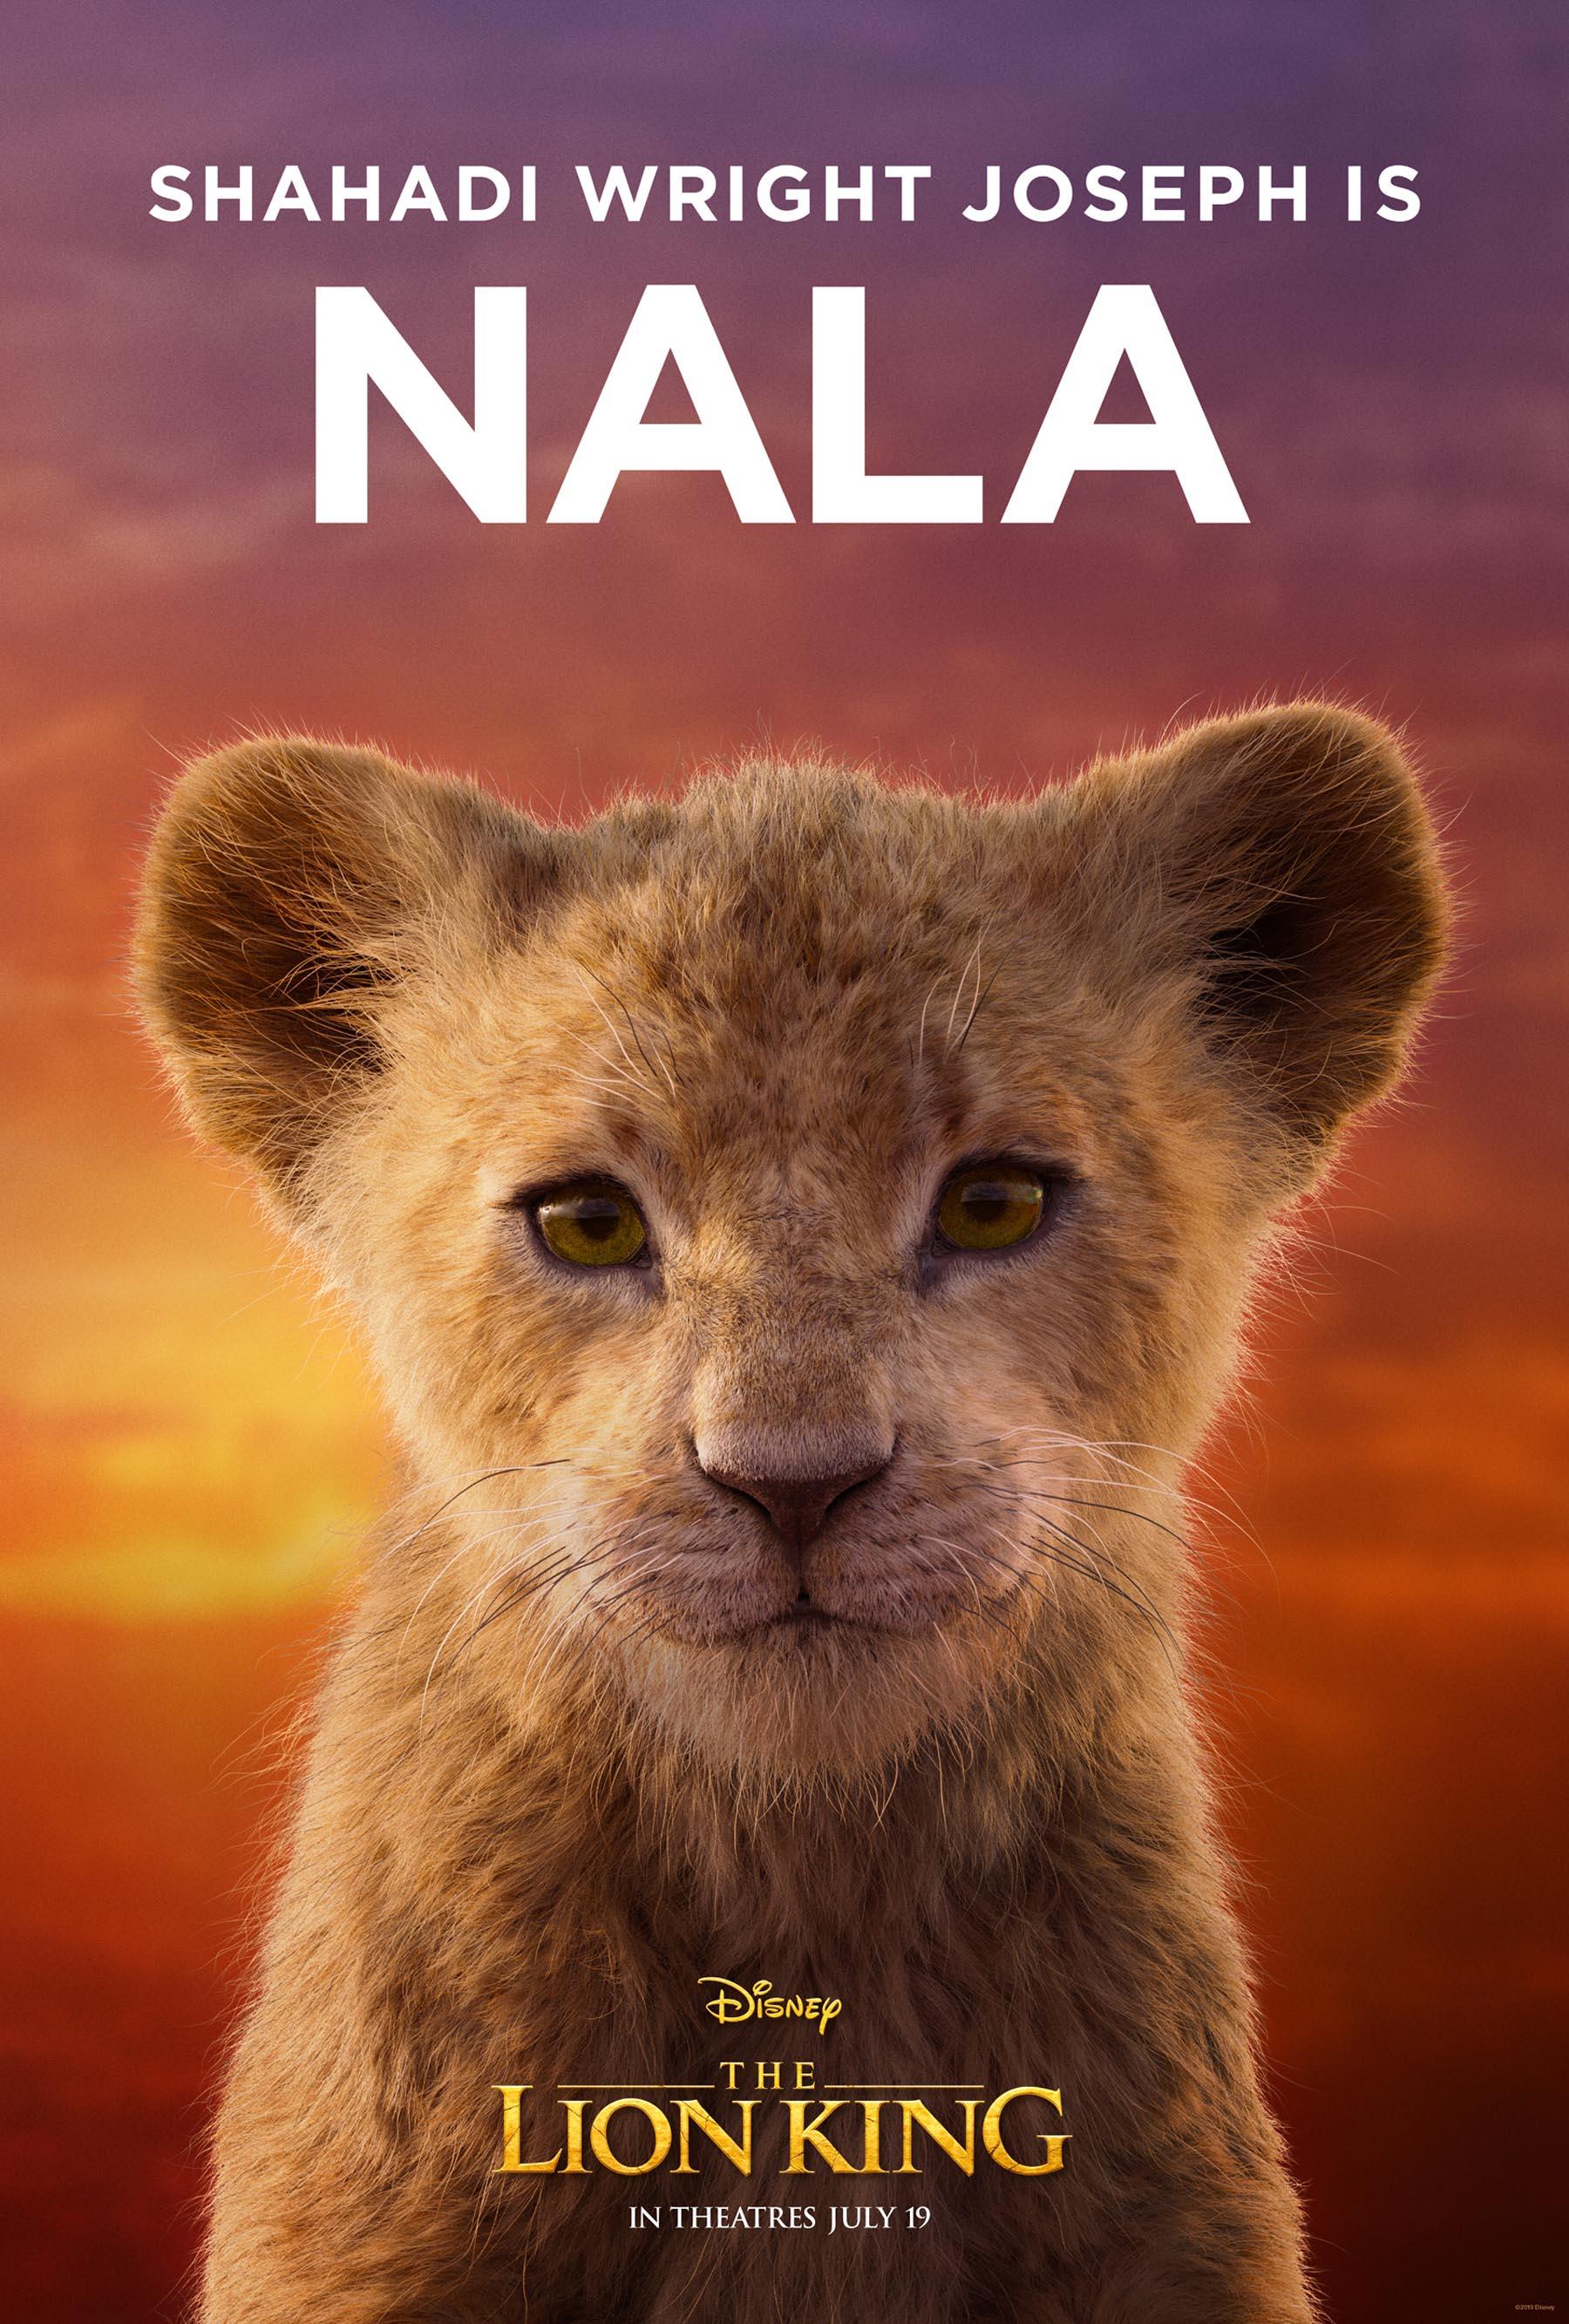 Lion King Stars To Visit Walt Disney World This Saturday Allears Net